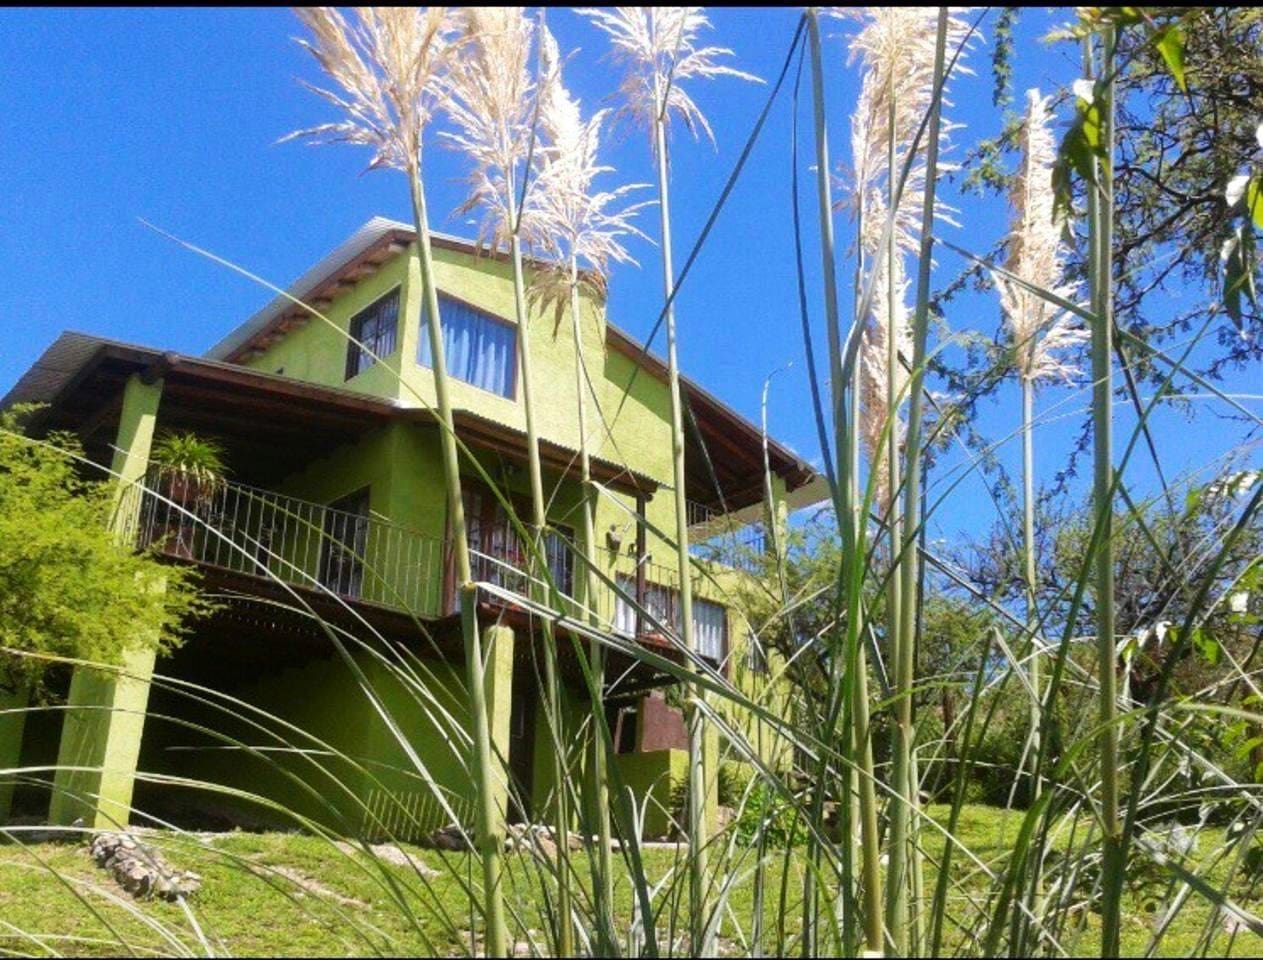 La Purisima, nuestra querida casa en La Serranita, provincia de Córdoba, Argentina